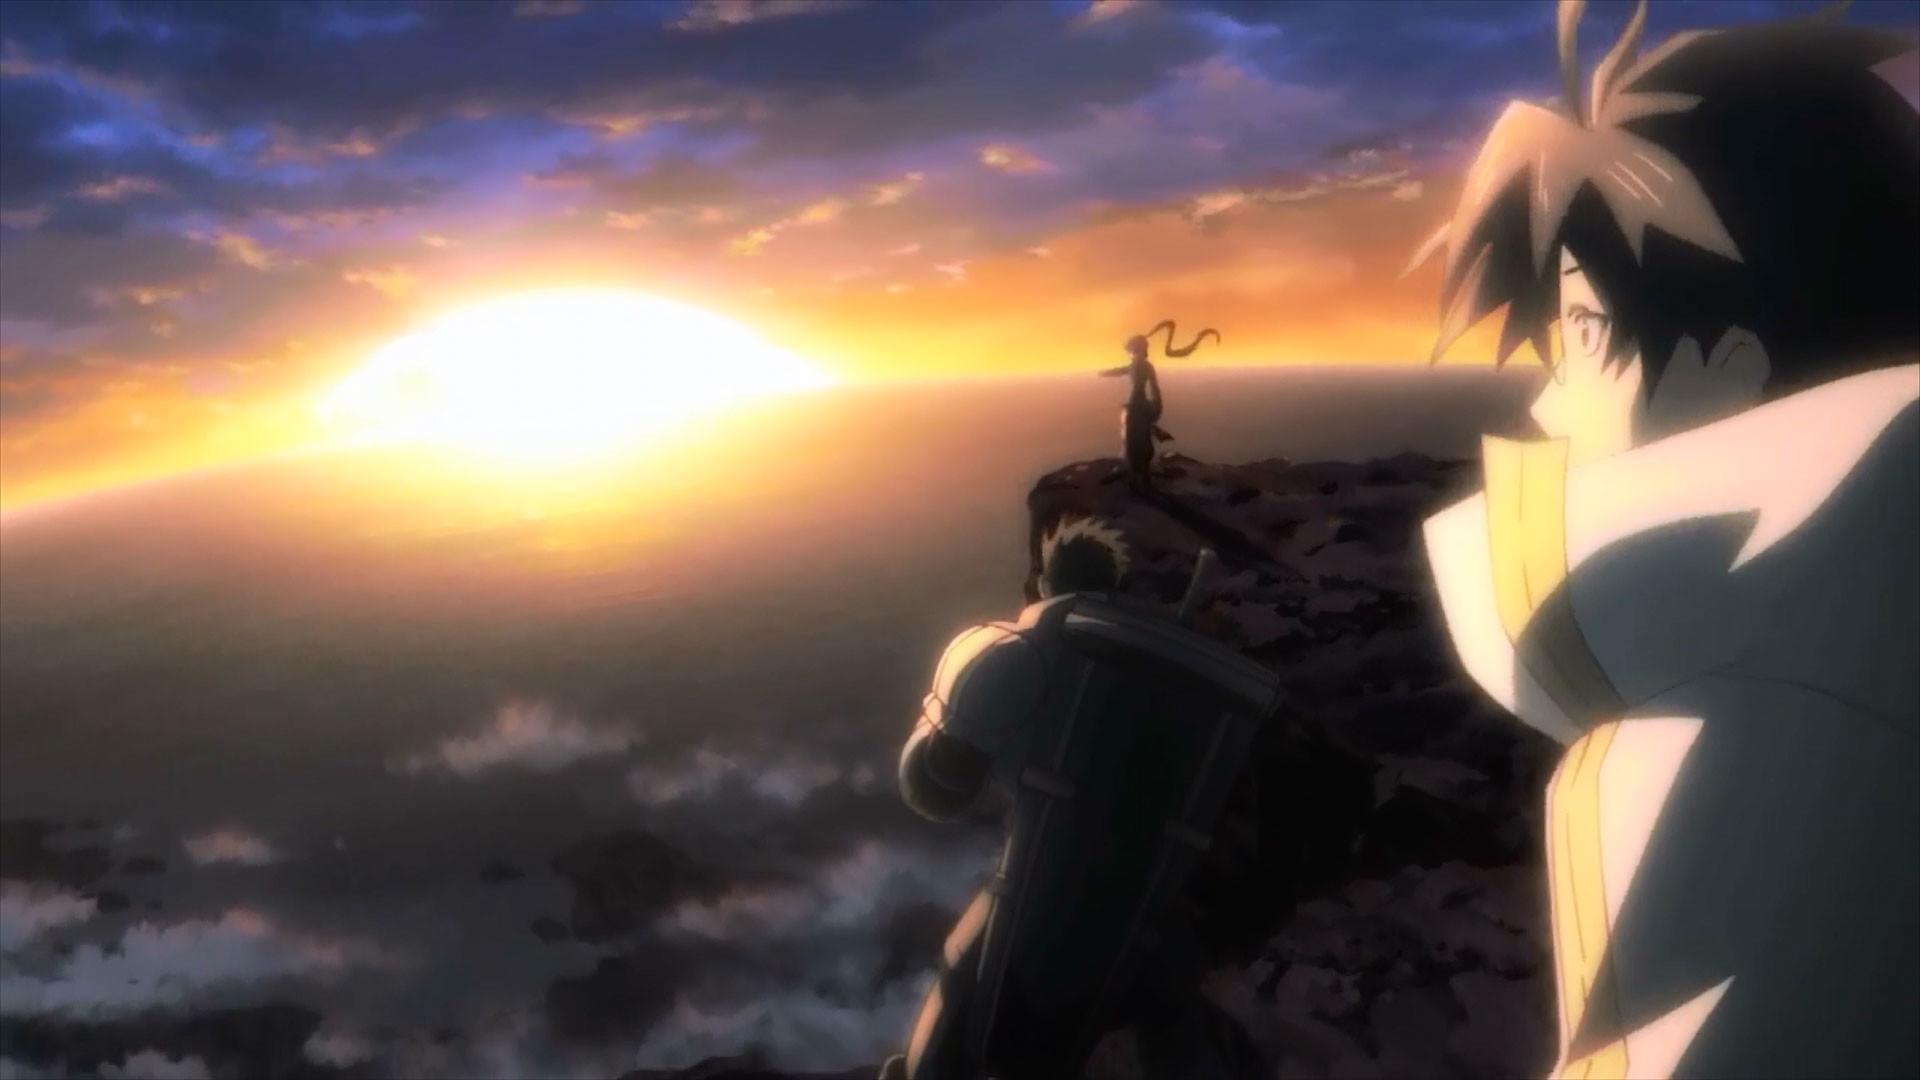 Log Horizon Anime Log Horizon Anime Wallpaper. Log Horizon Akatsuki